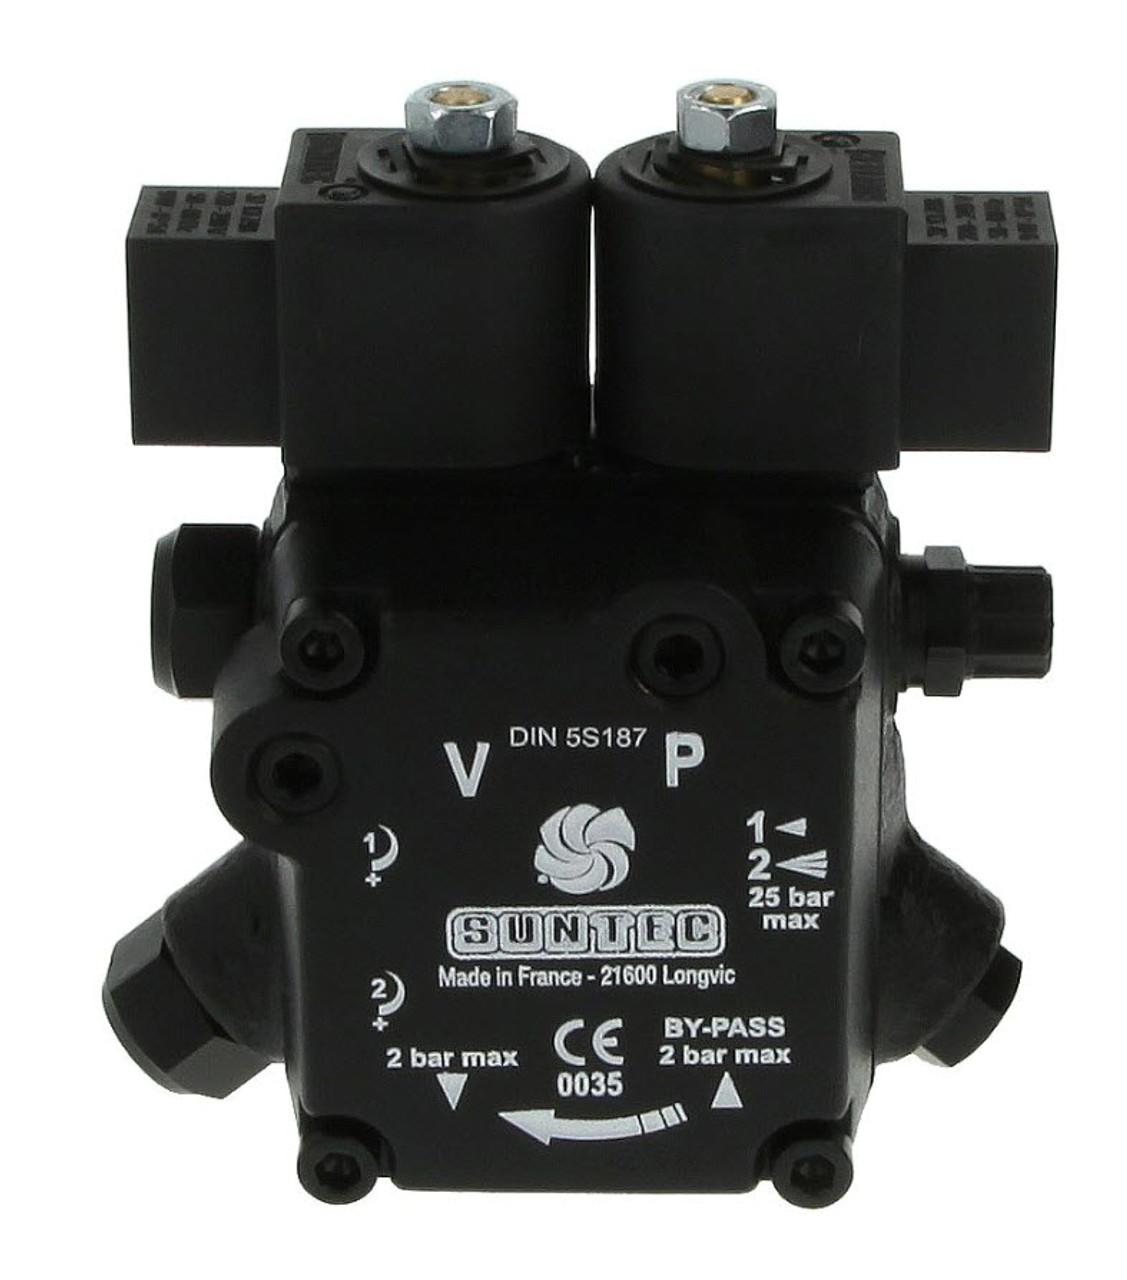 Weishaupt Oil burner pump AT2V45C 9602 4P0700, 601865